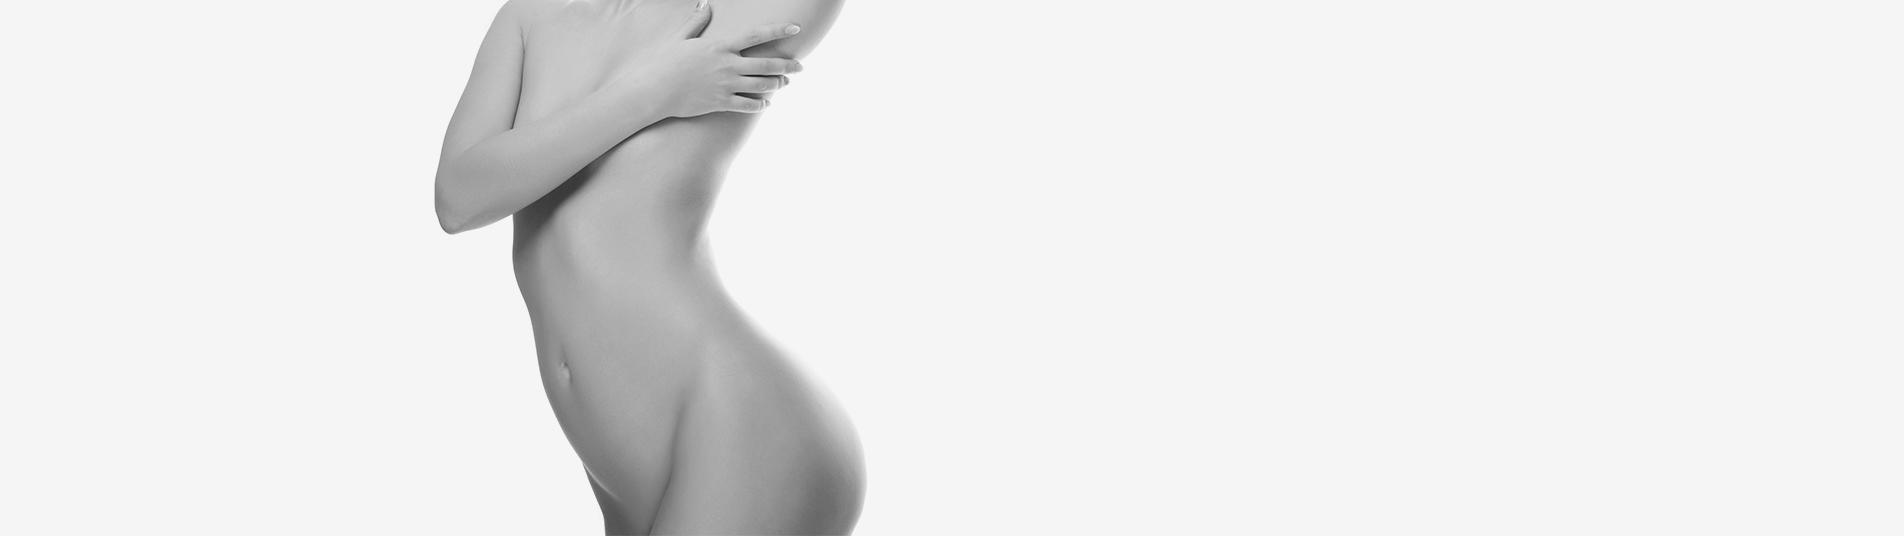 chirurgie-silhouette-docteur-julien-luini-chirurgie-esthetique-antibes